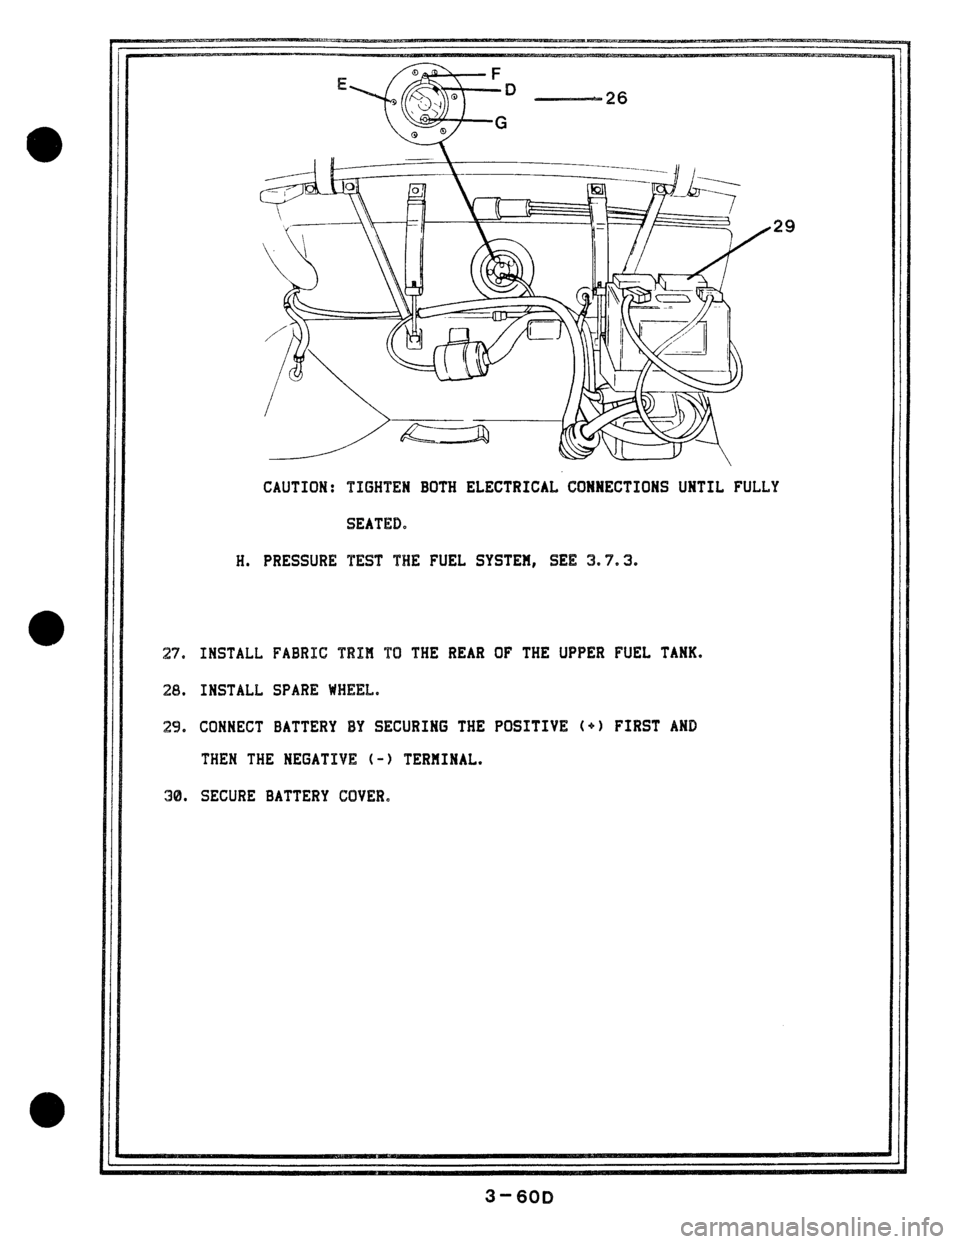 medium resolution of g workshop manual on jaguar xjs 1995 fuse box diagram